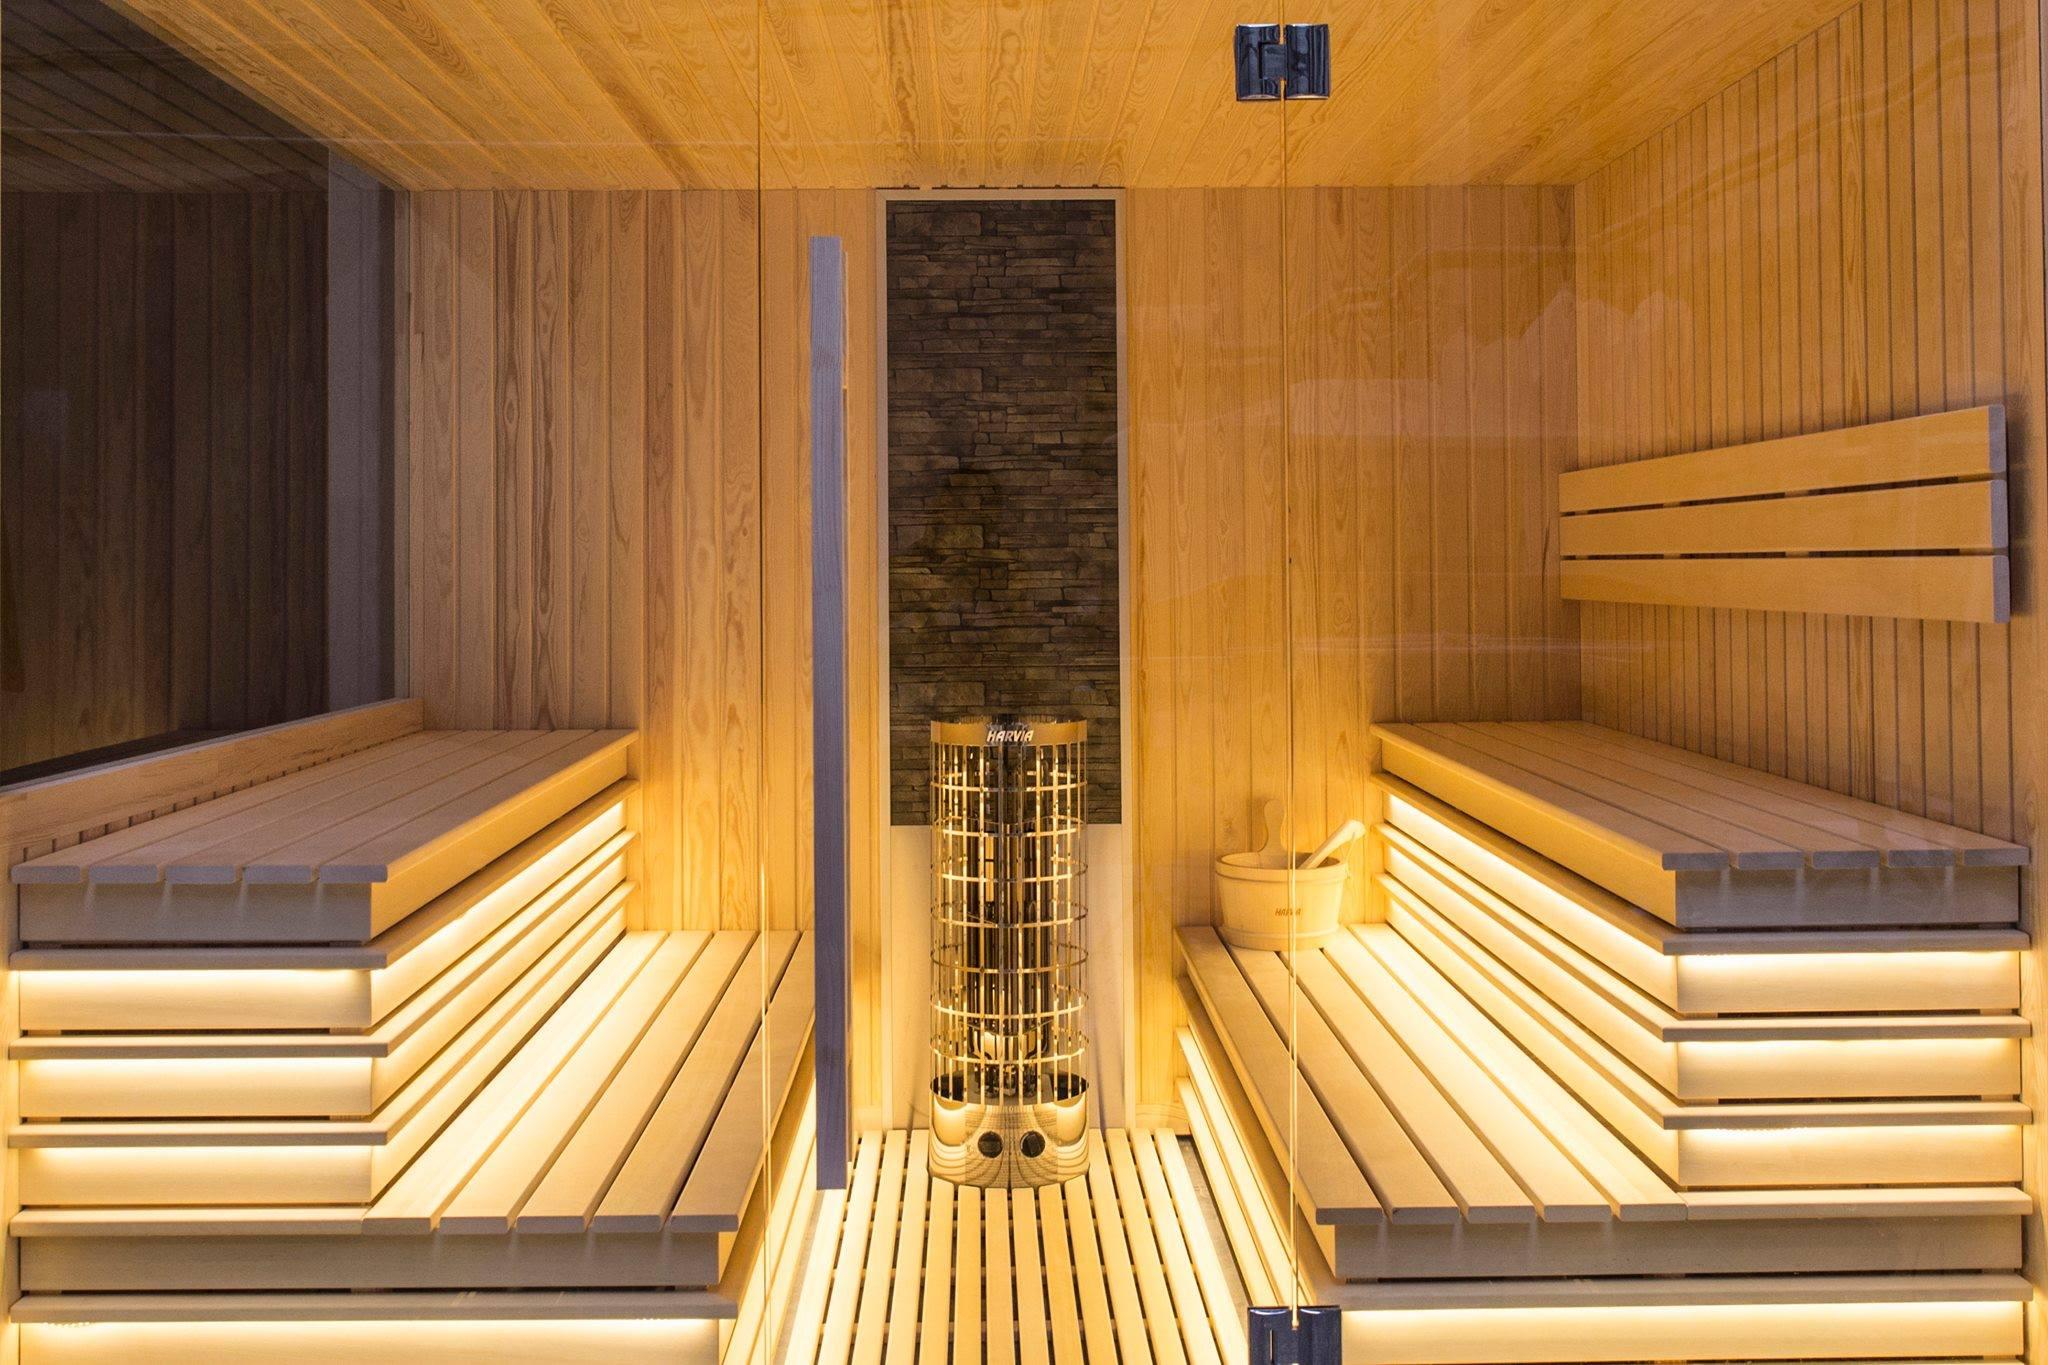 sauna miramonte lumiere led pin encastrable spa concept luxembourg belgique 1